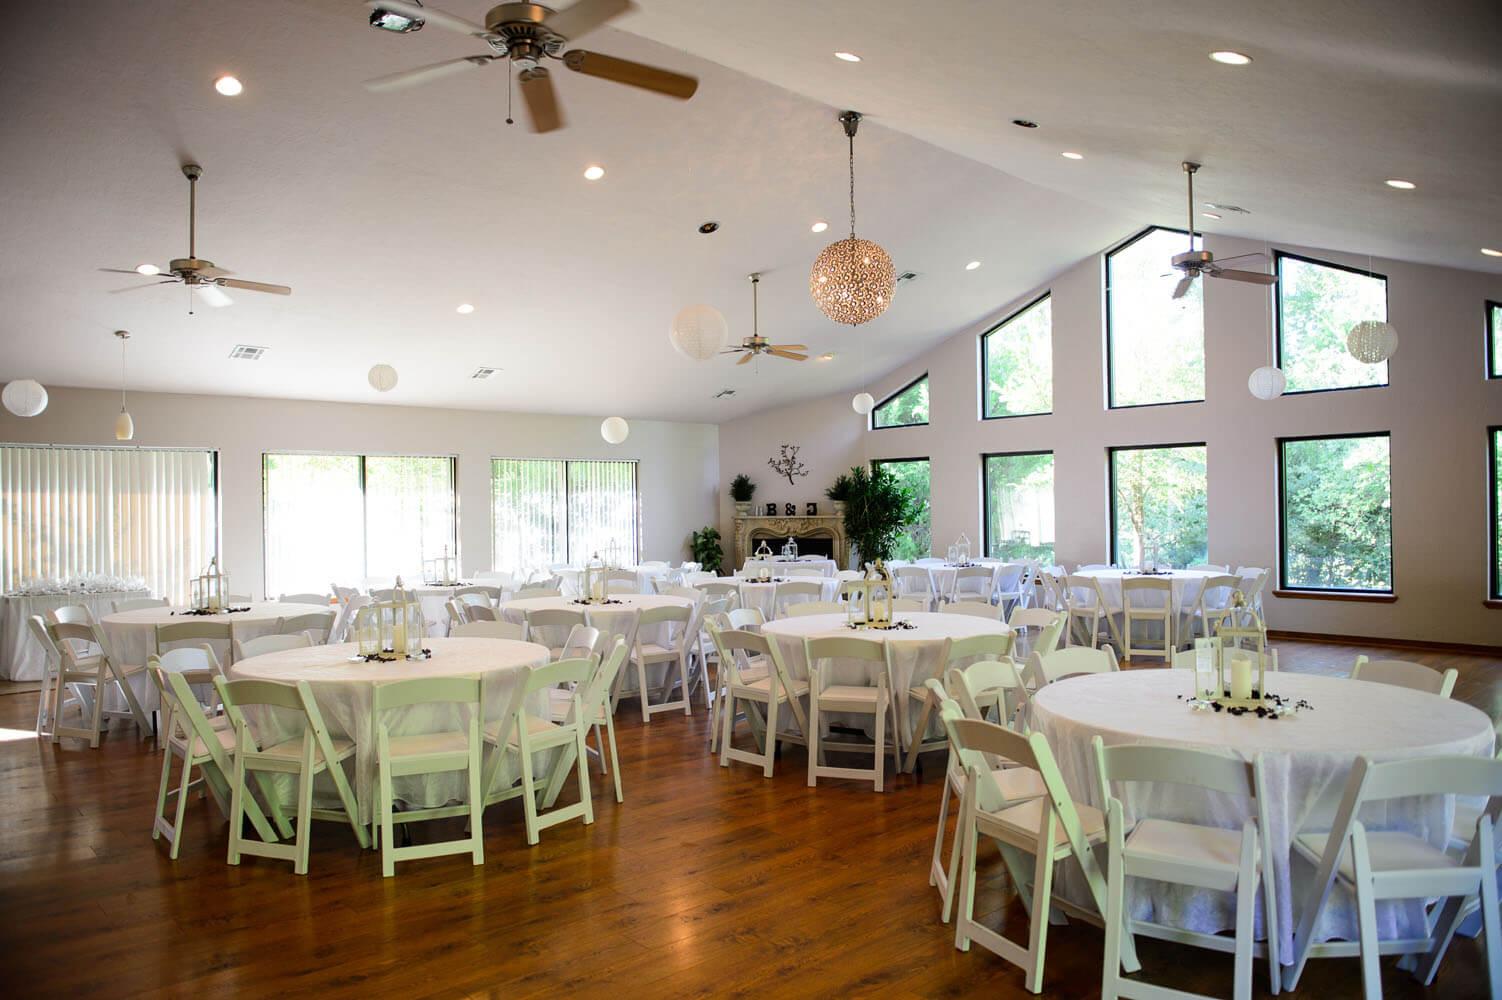 Reception Area At Thunderbird Chapel In Norman Oklahoma Thunderbirdchapel Normanoklahoma Wedding